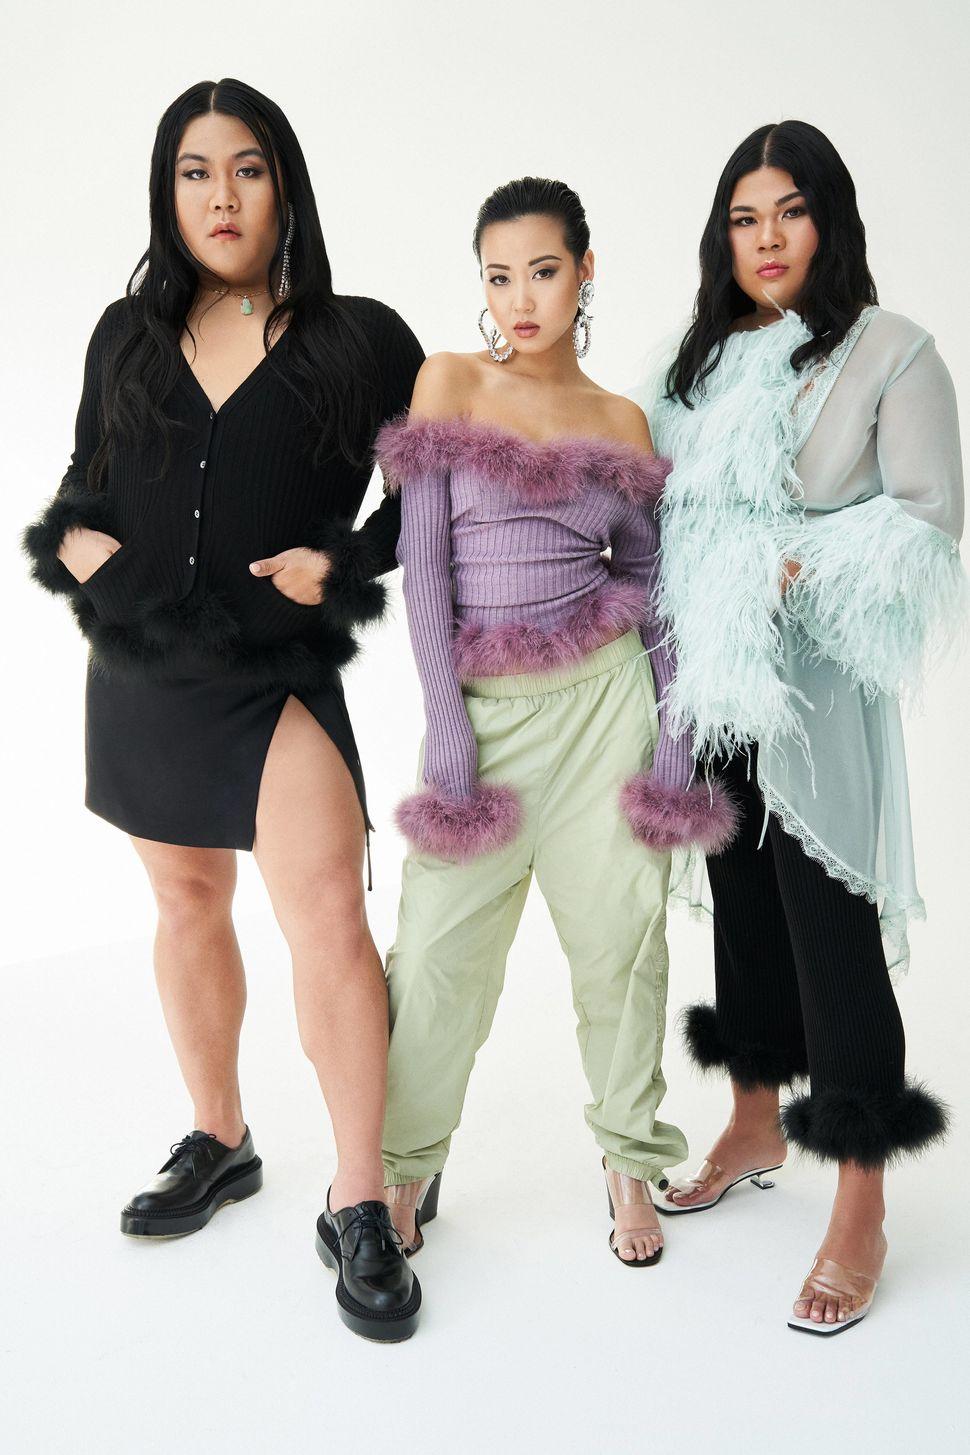 Kyle Luu, Fiffany Luu, DeSe Escobar (the Glam Collective)